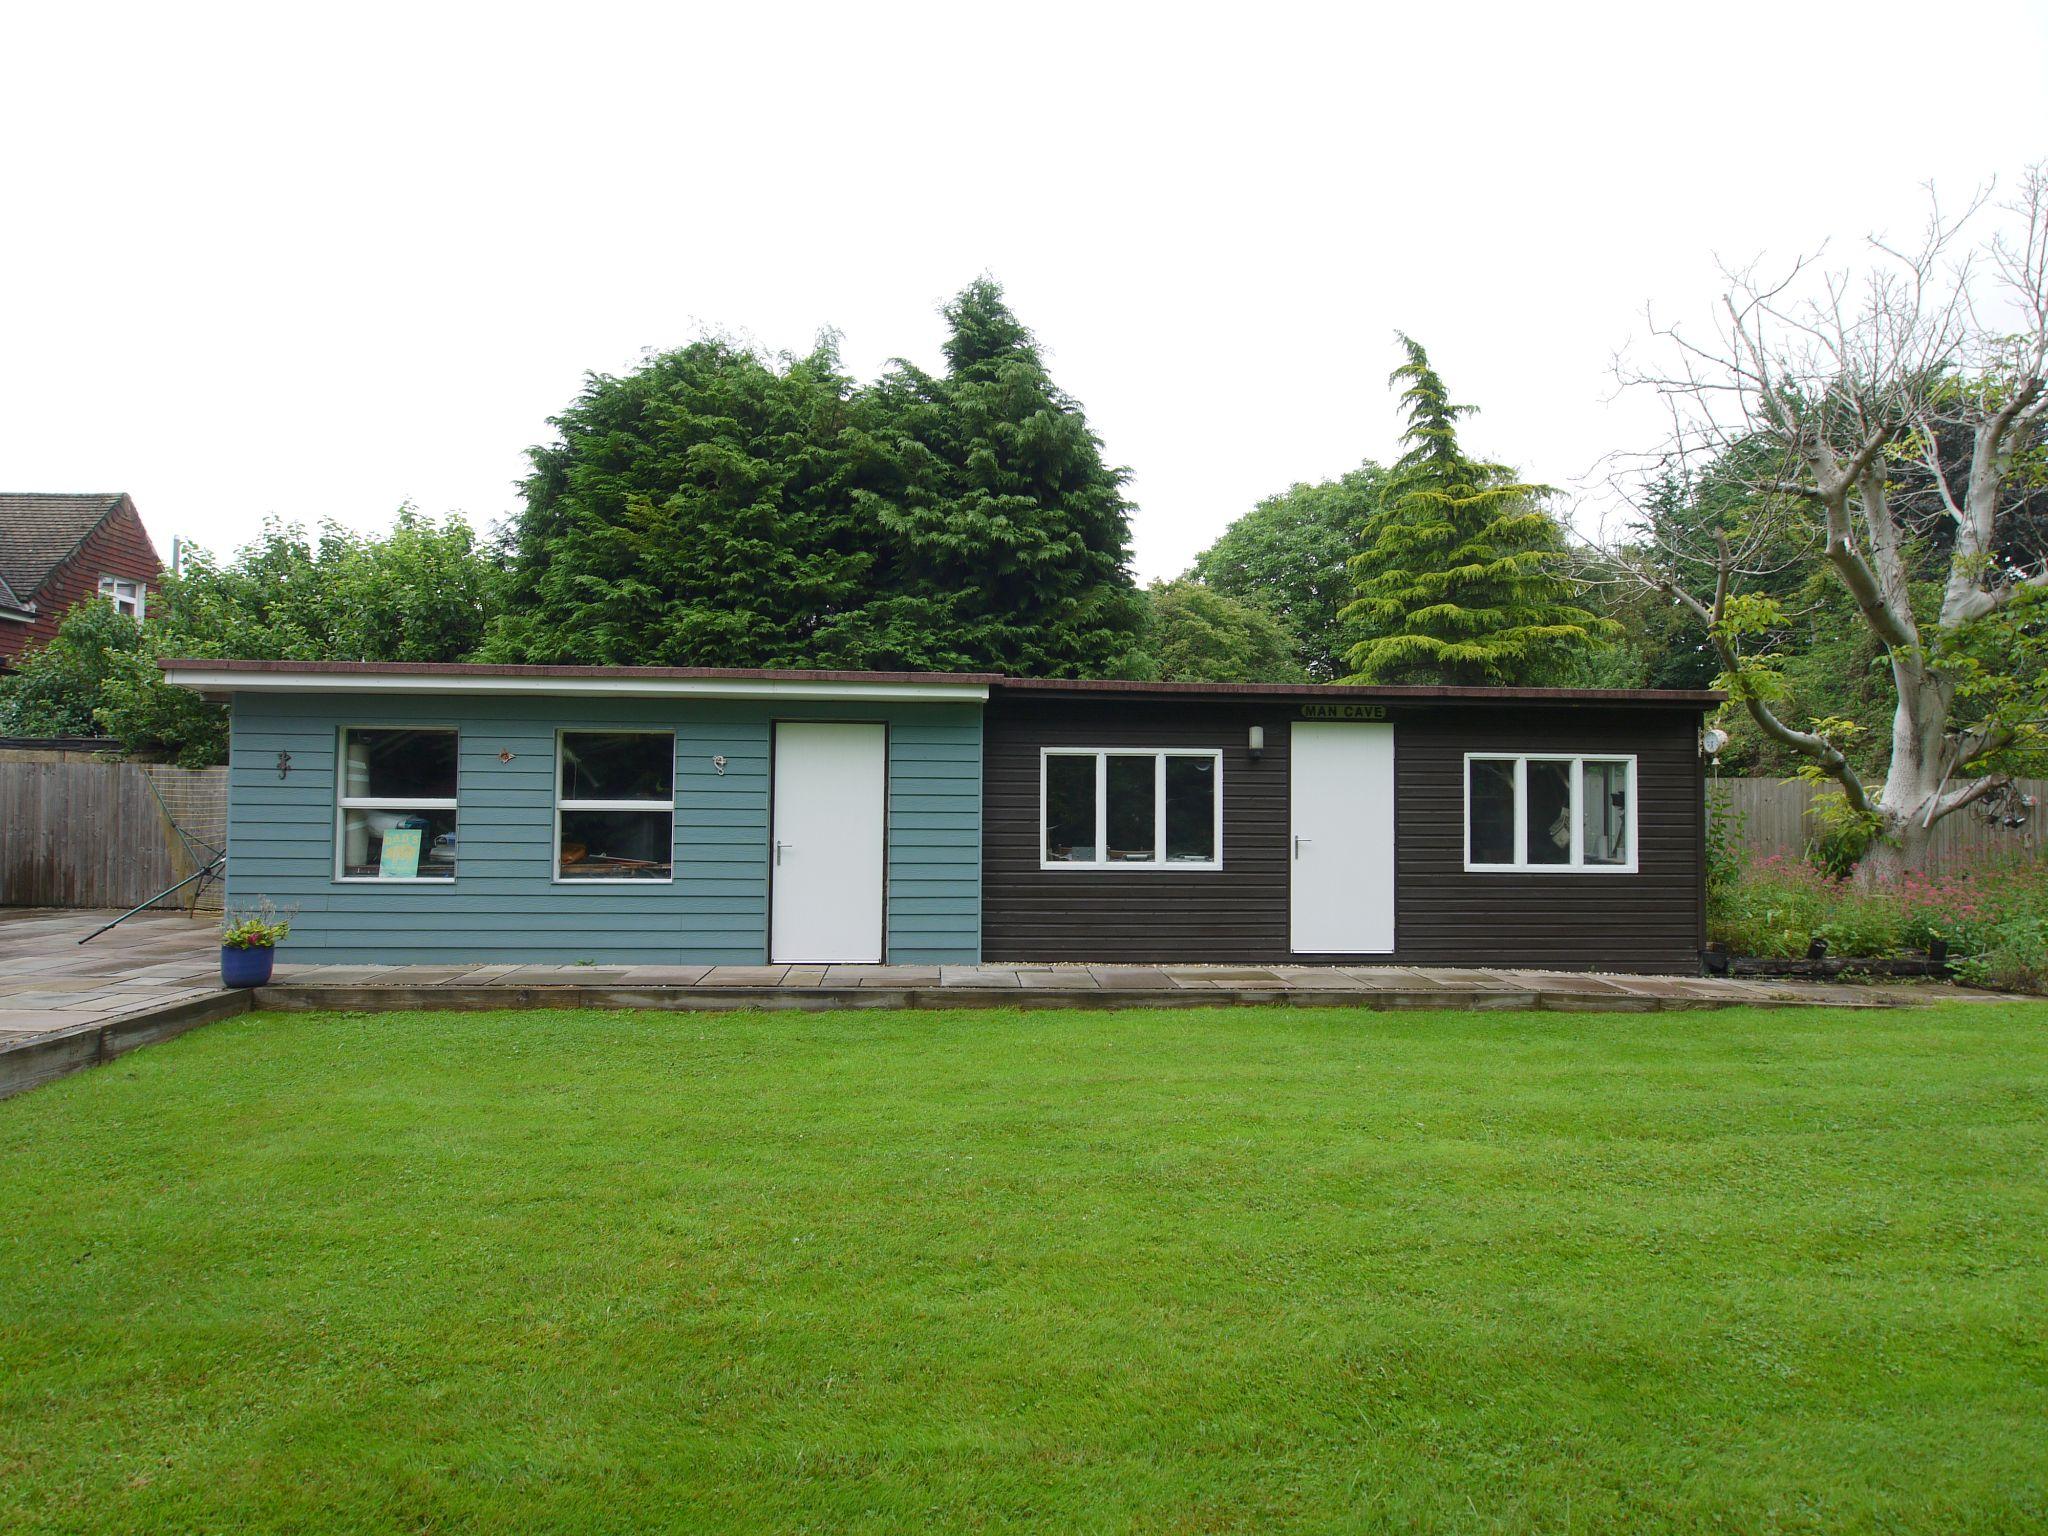 5 bedroom detached house Sold in Sevenoaks - Photograph 19